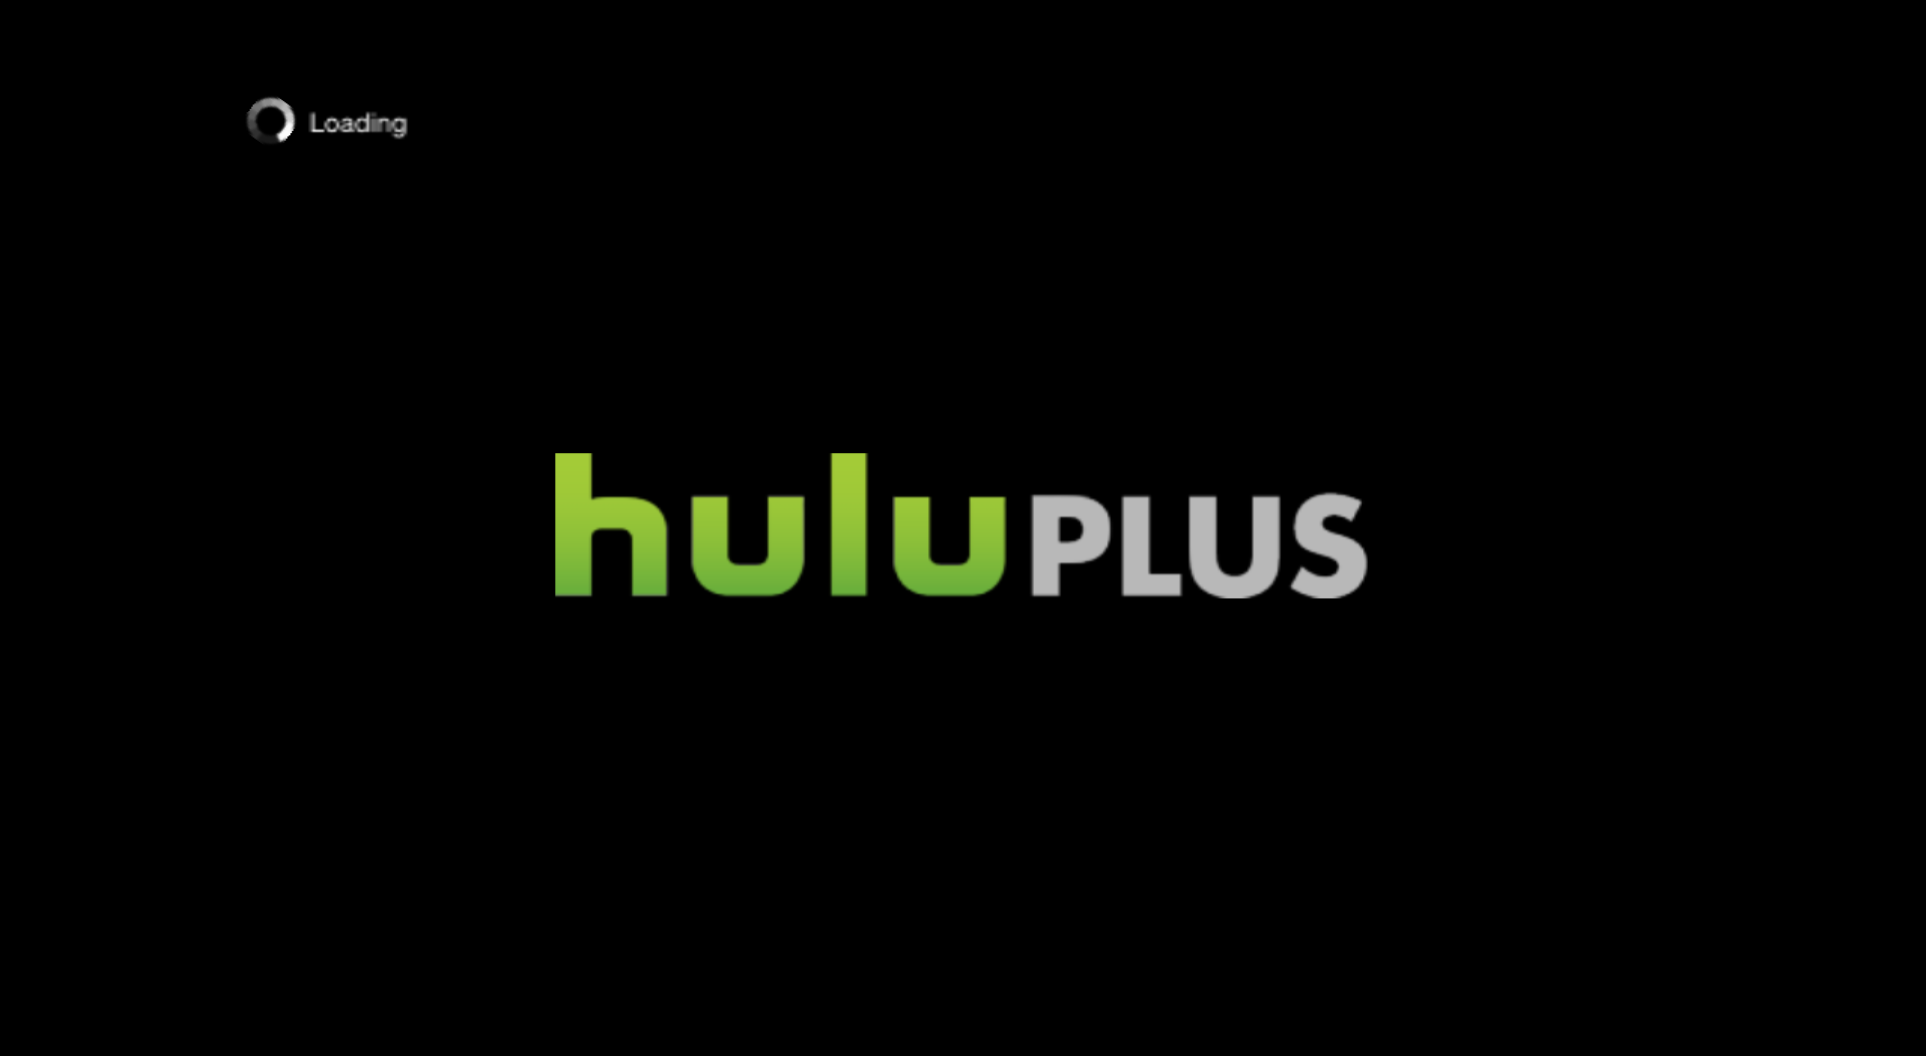 hulu plus review